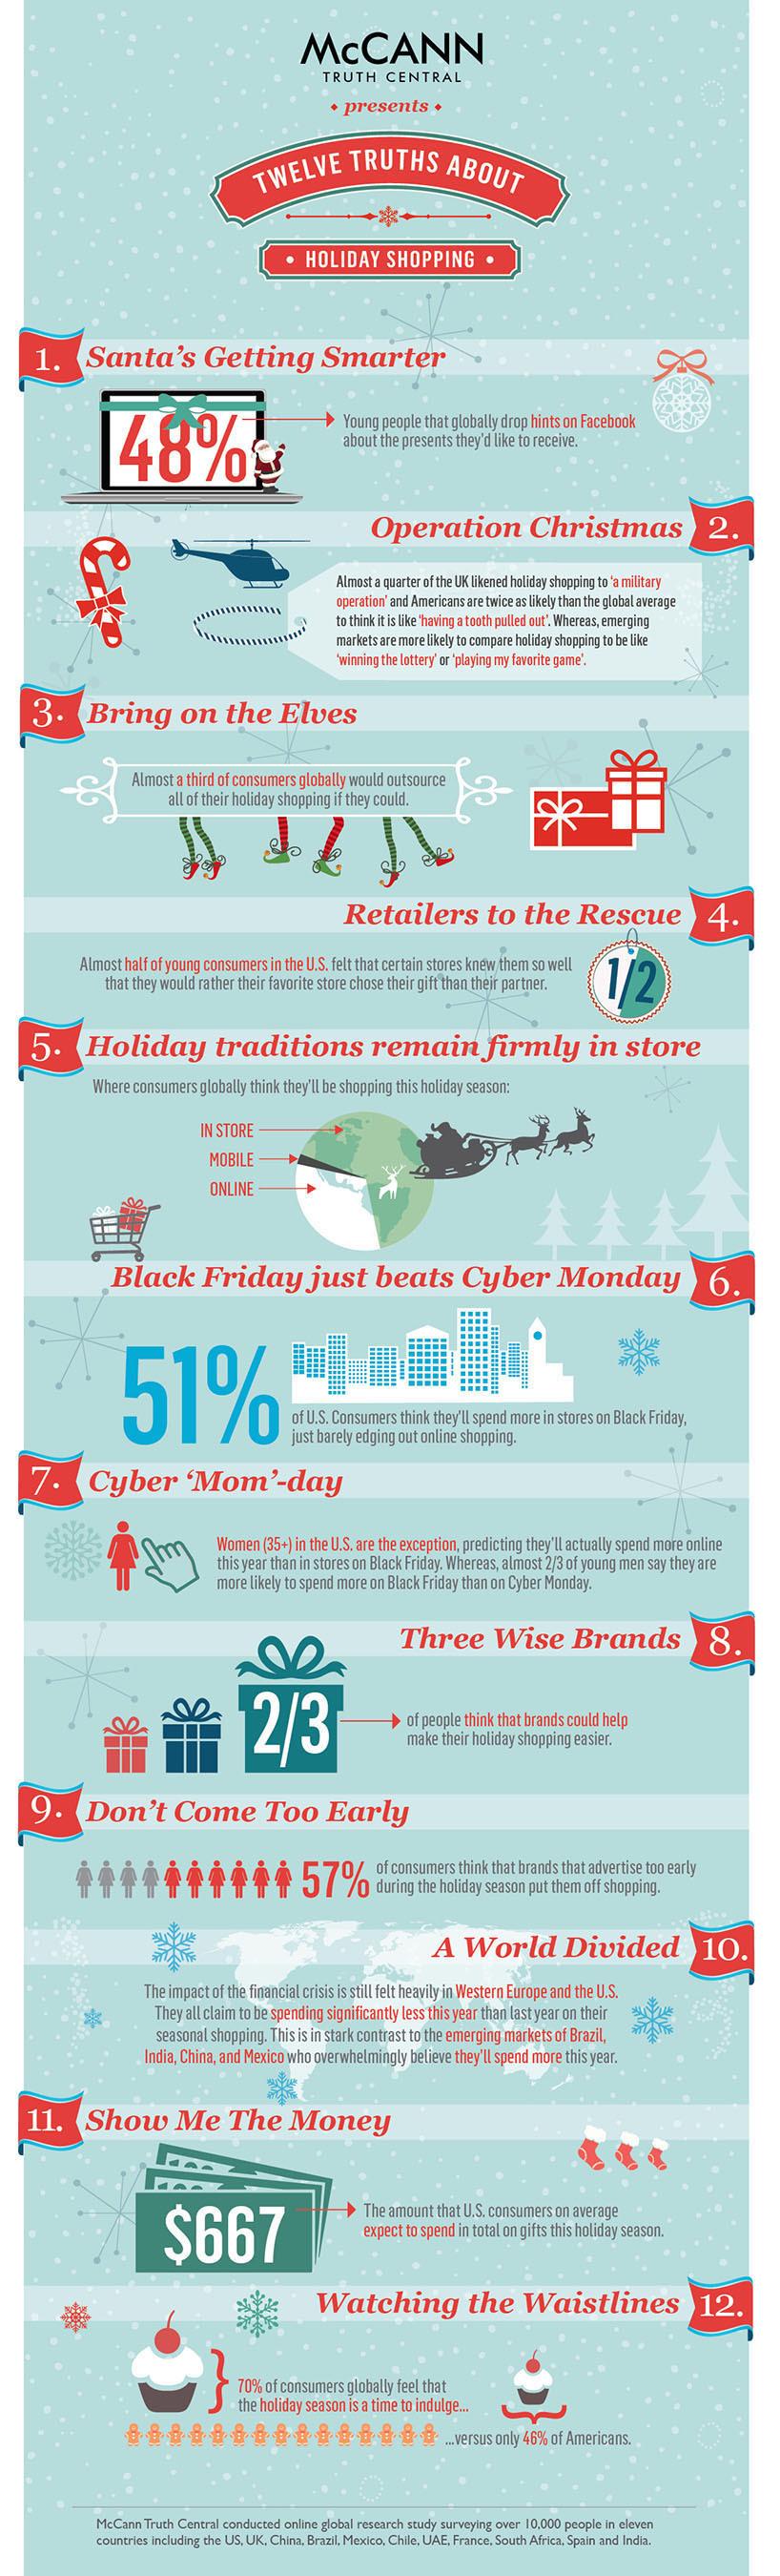 McCann's 12 Truths About Holiday Shopping.  (PRNewsFoto/McCann Erickson)